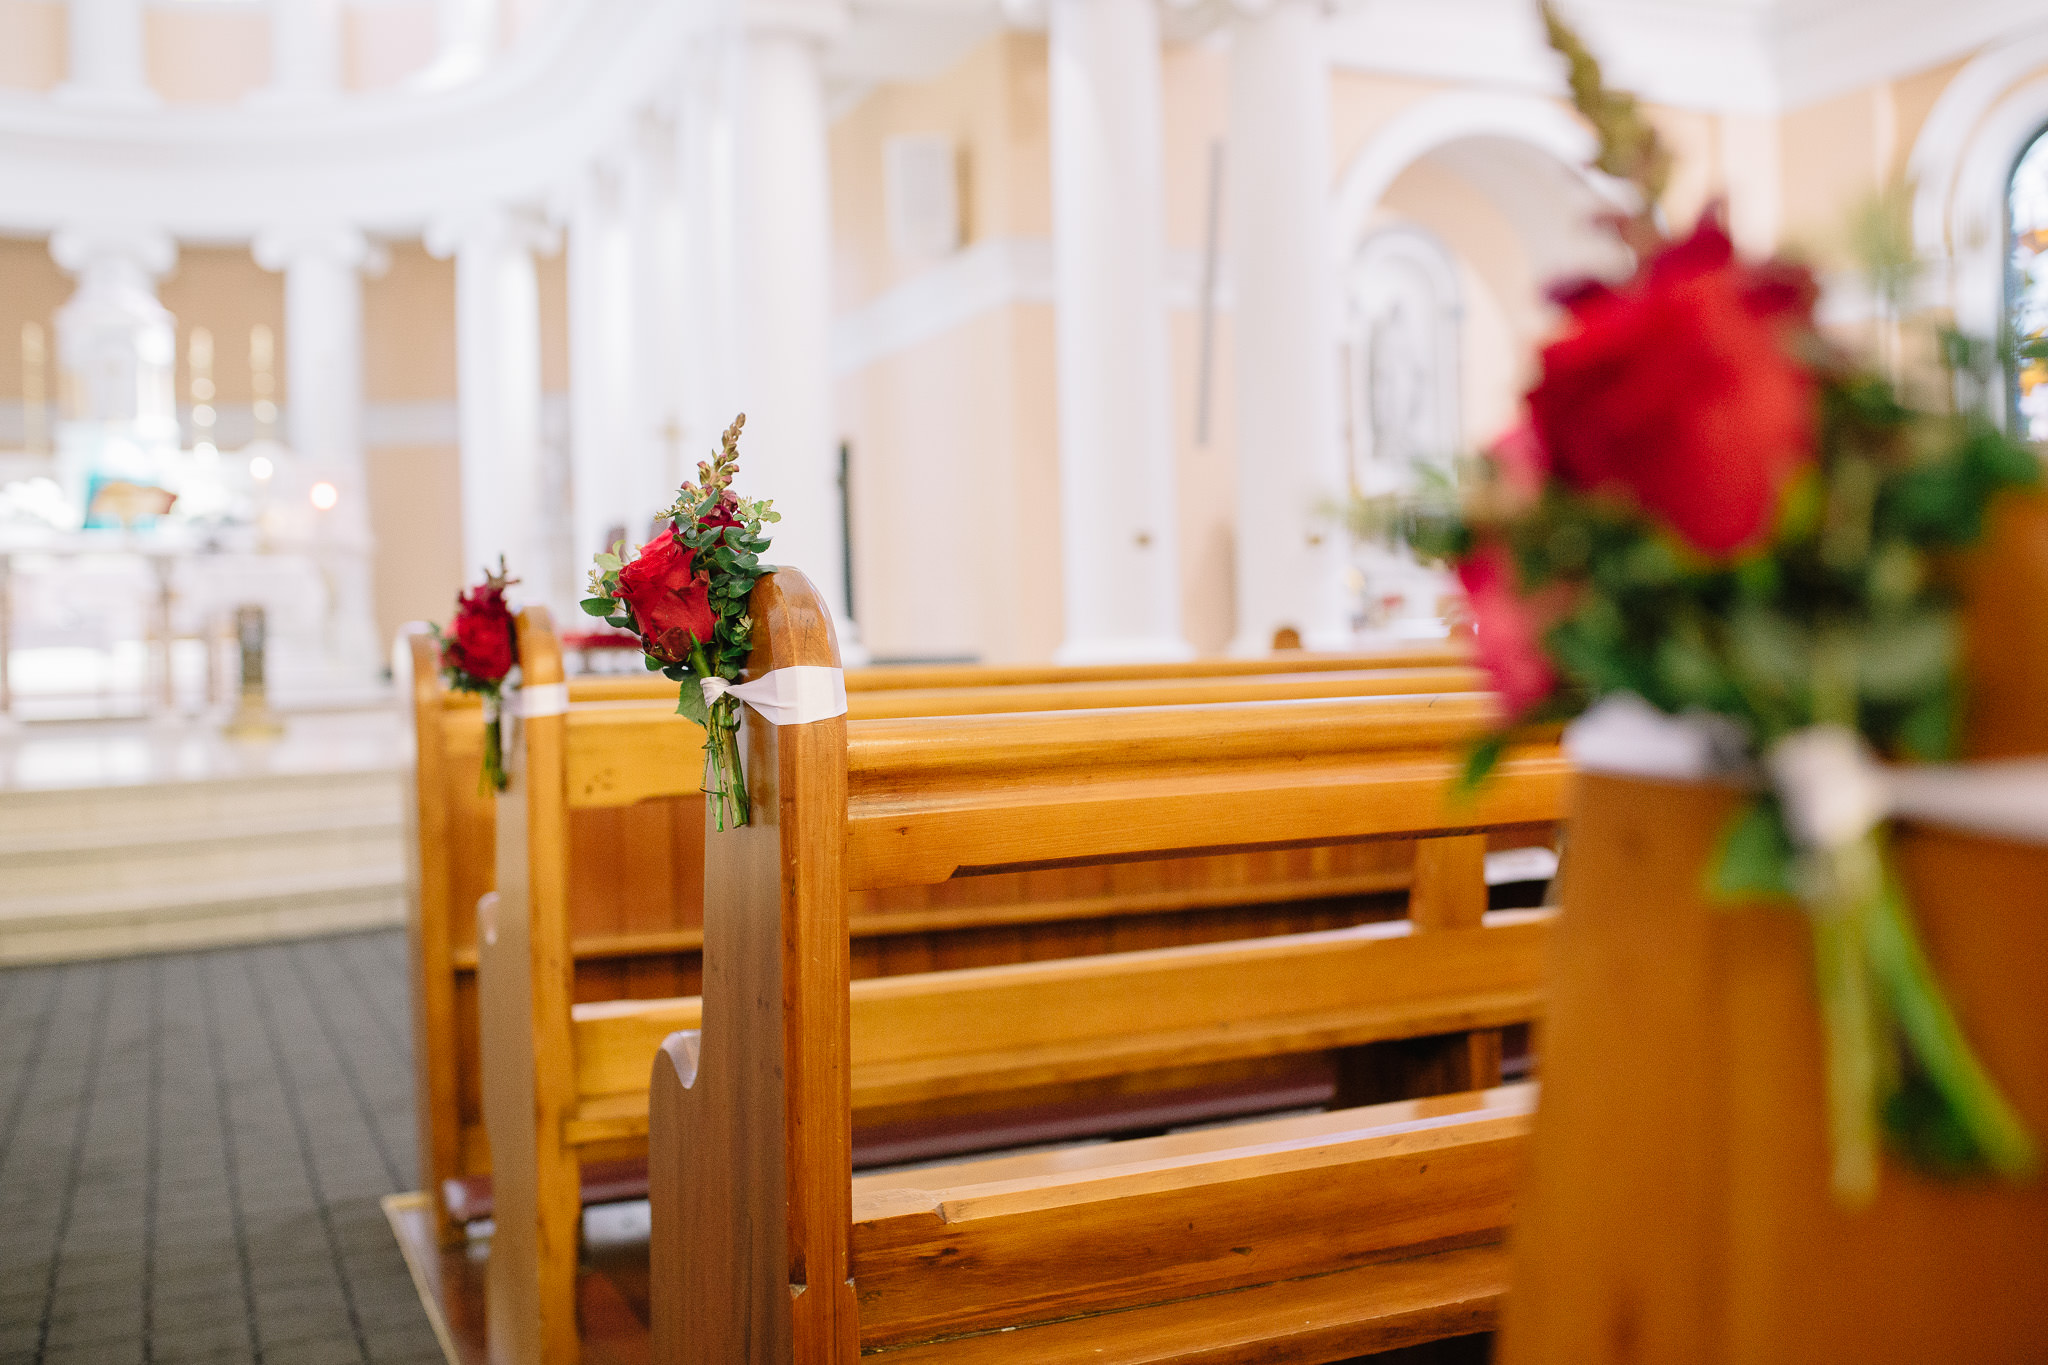 Church Pew Florals